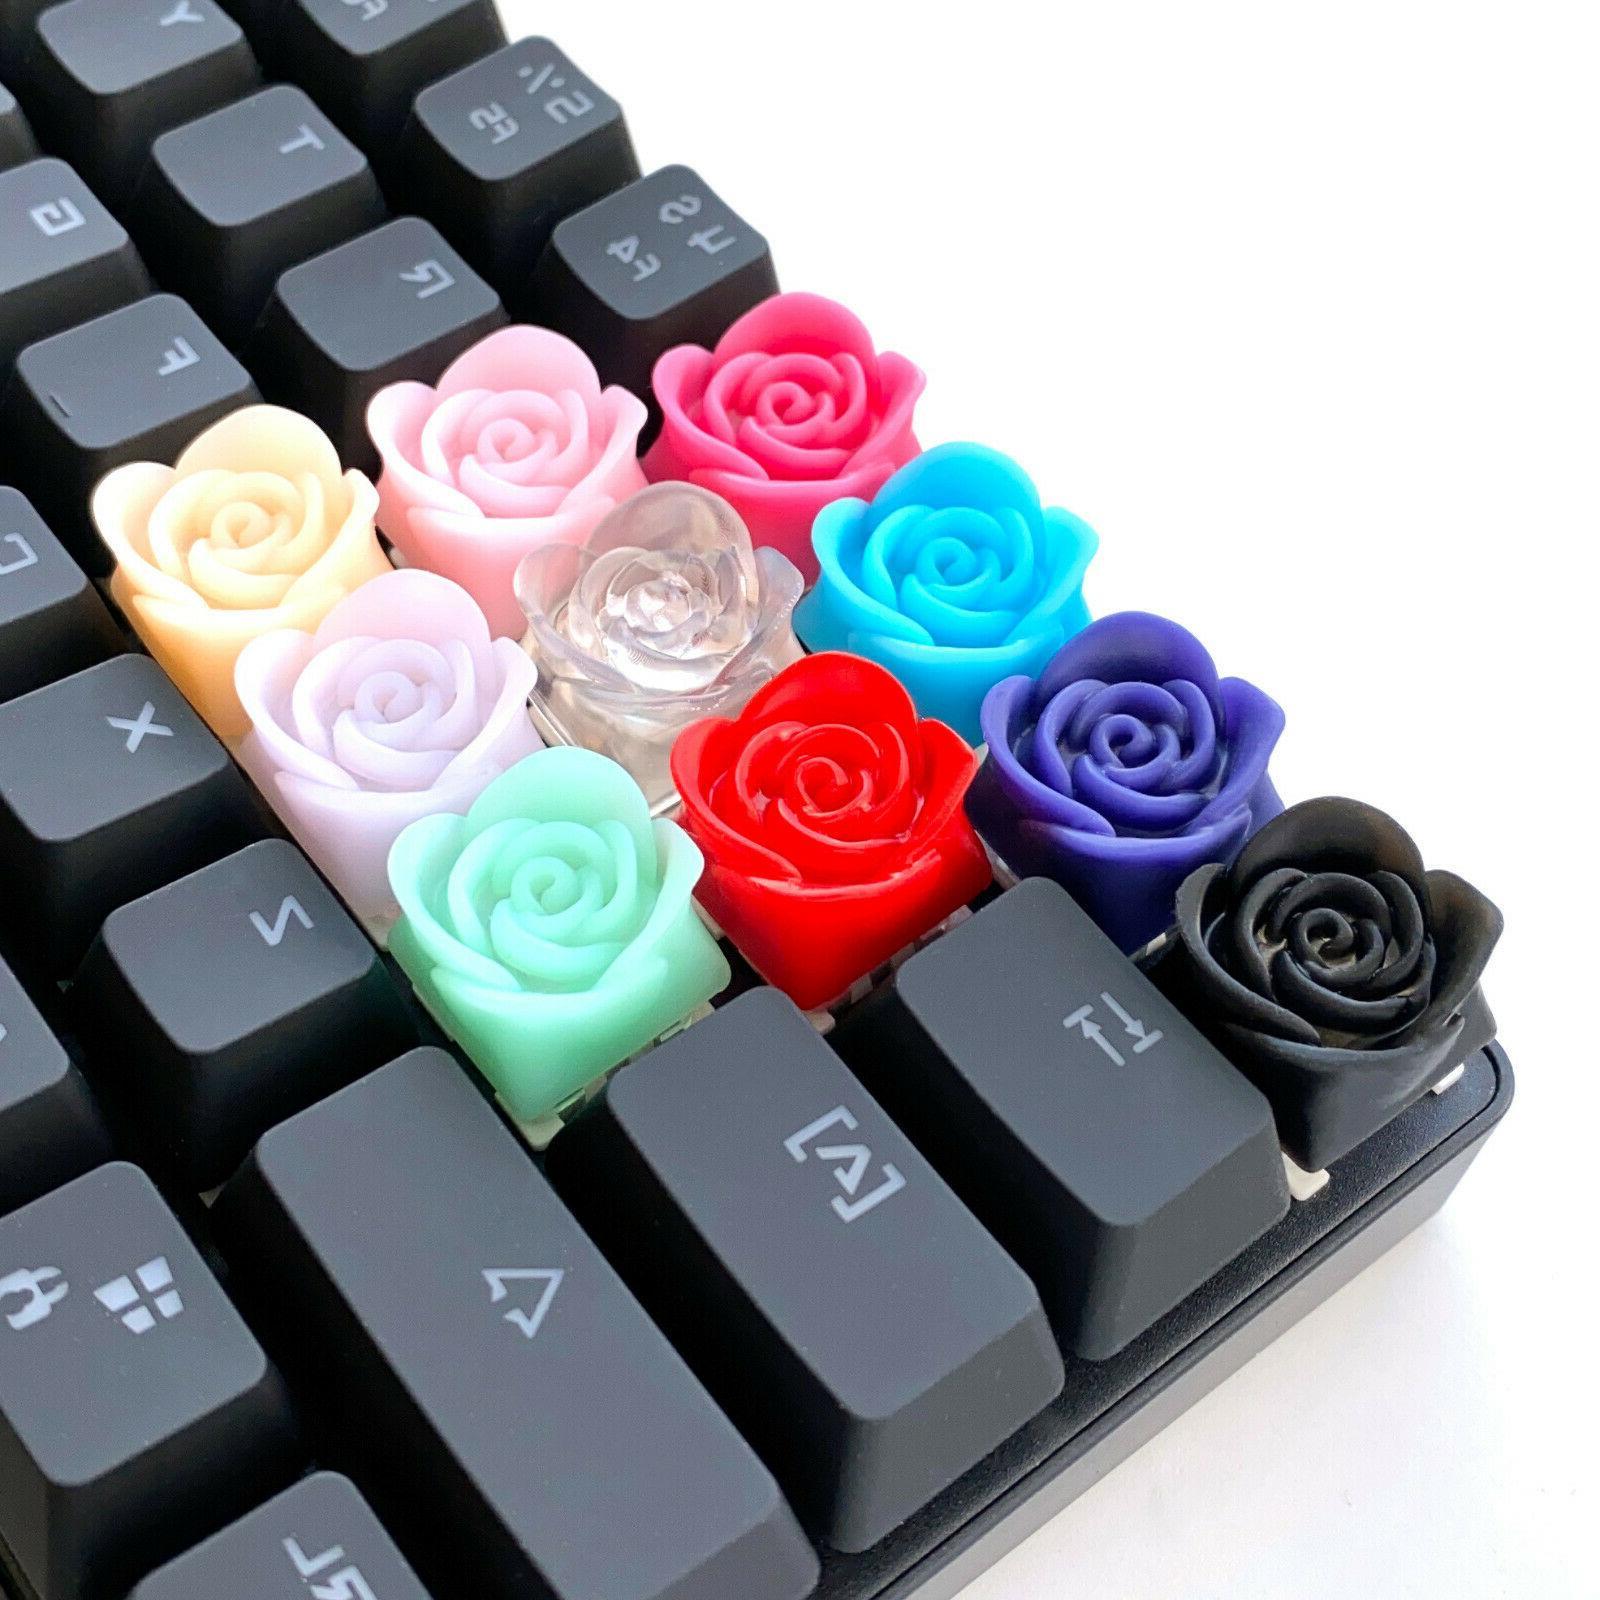 rose flower artisan keycap cherry mx mechanical